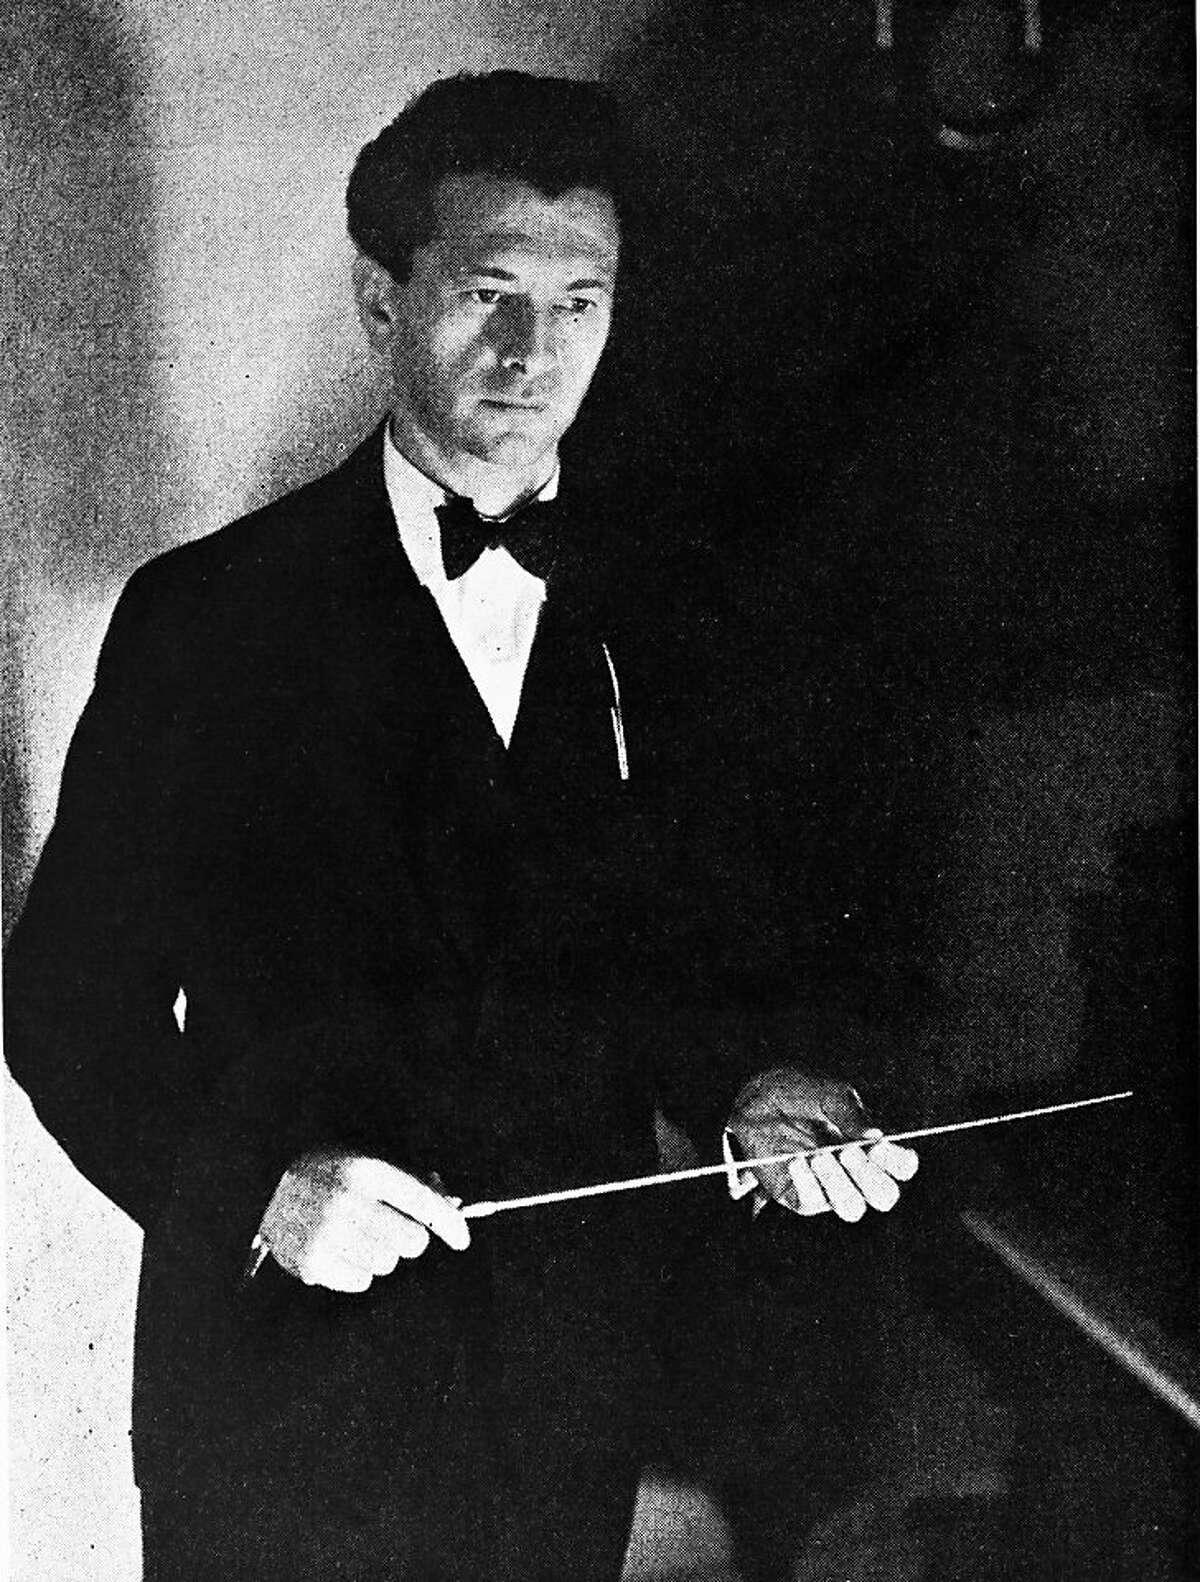 Issay Dobrowen, San Francisco Symphony conductor